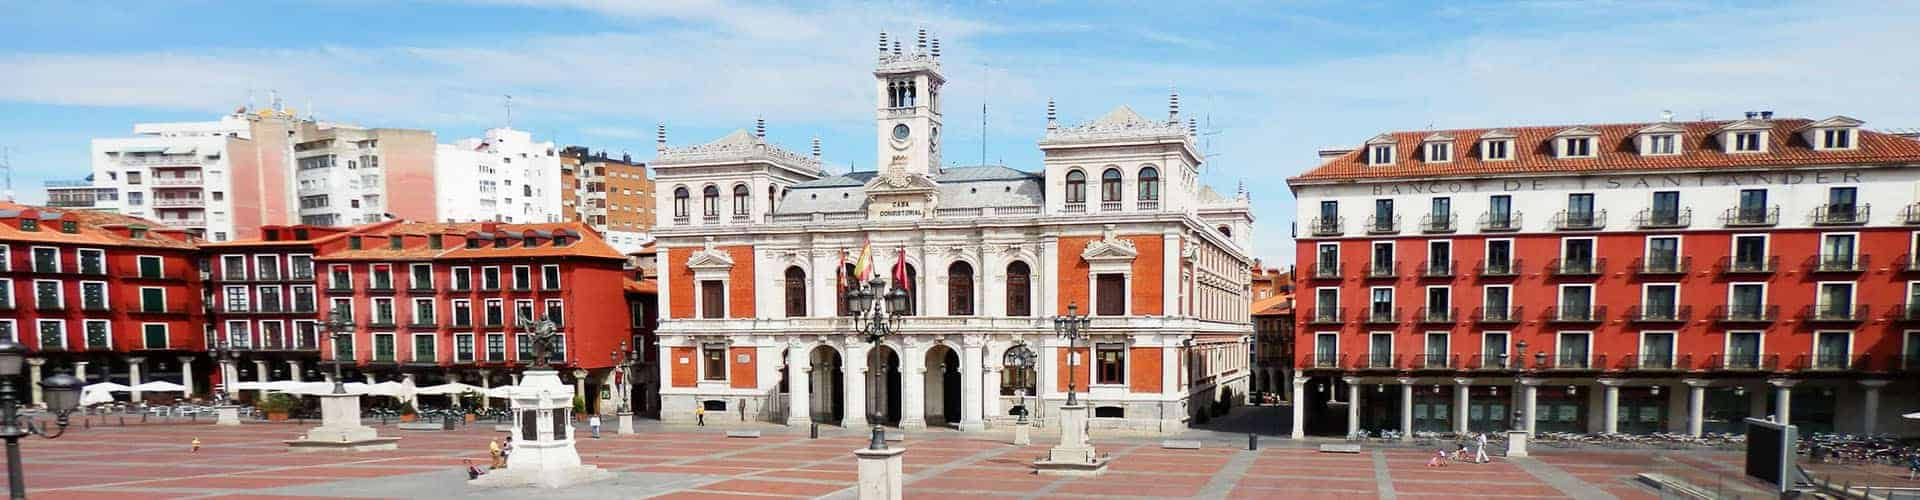 Punto de encuentro - Turismo de España